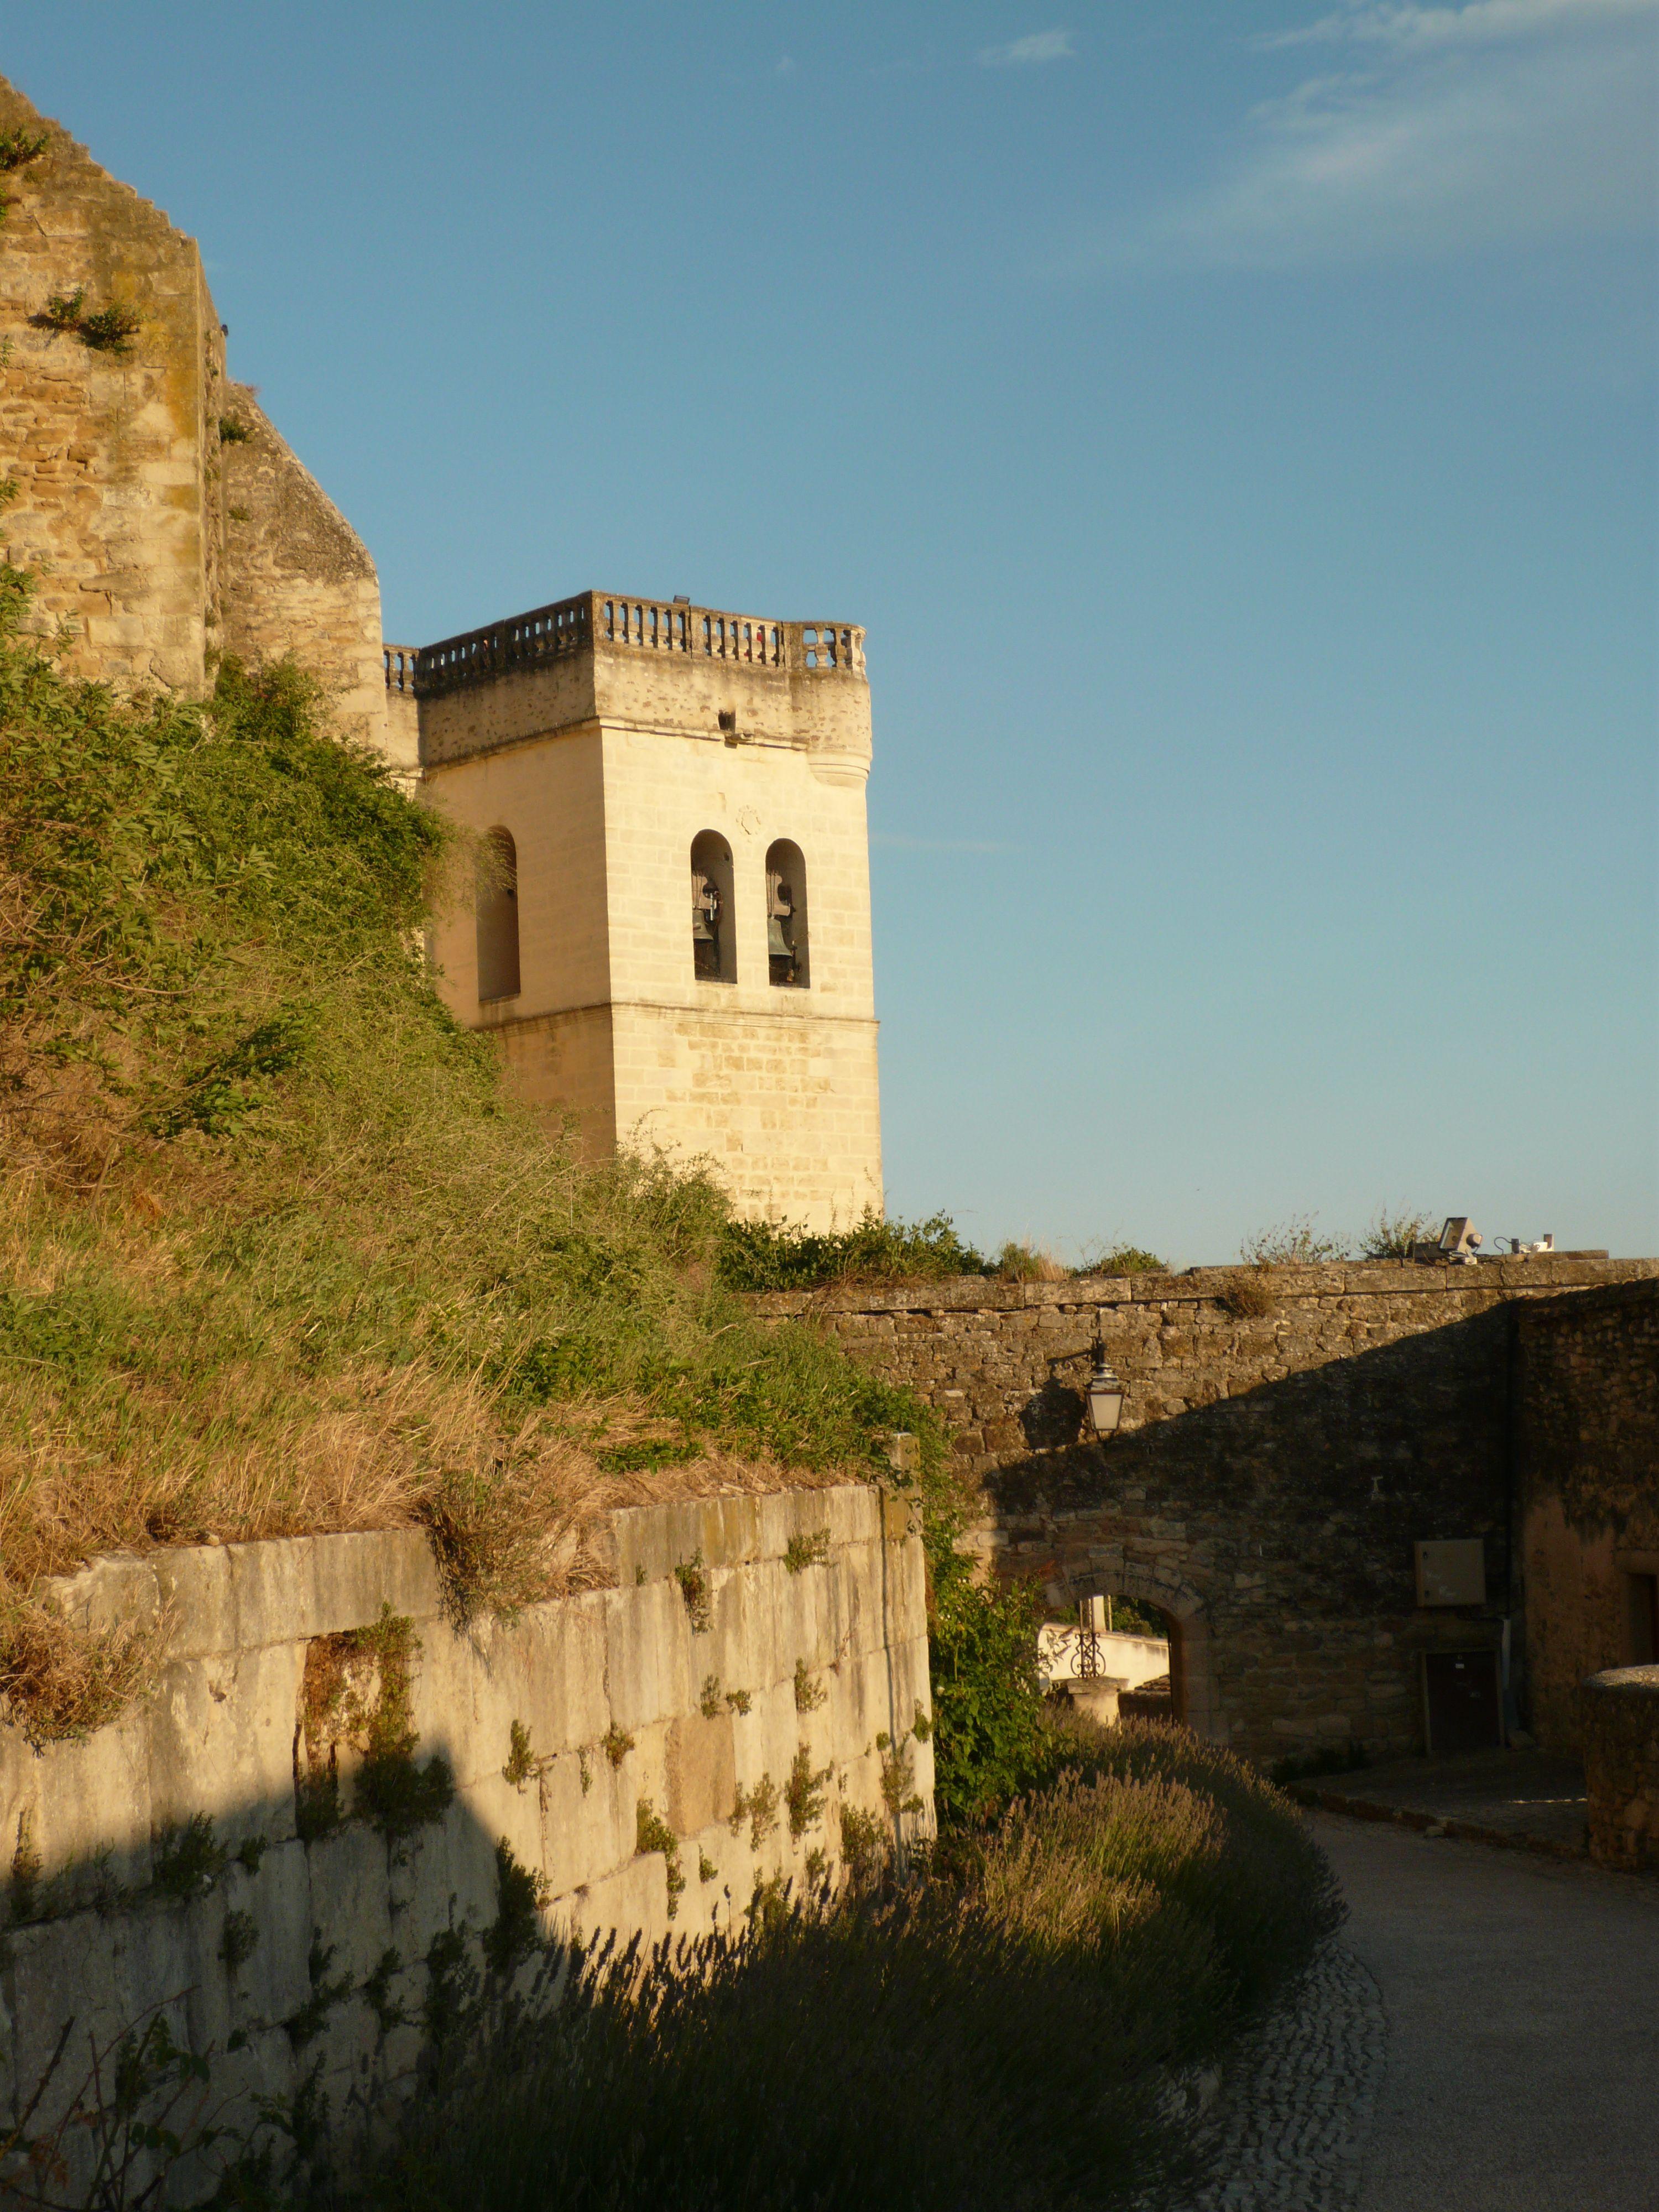 Grignan, Provence